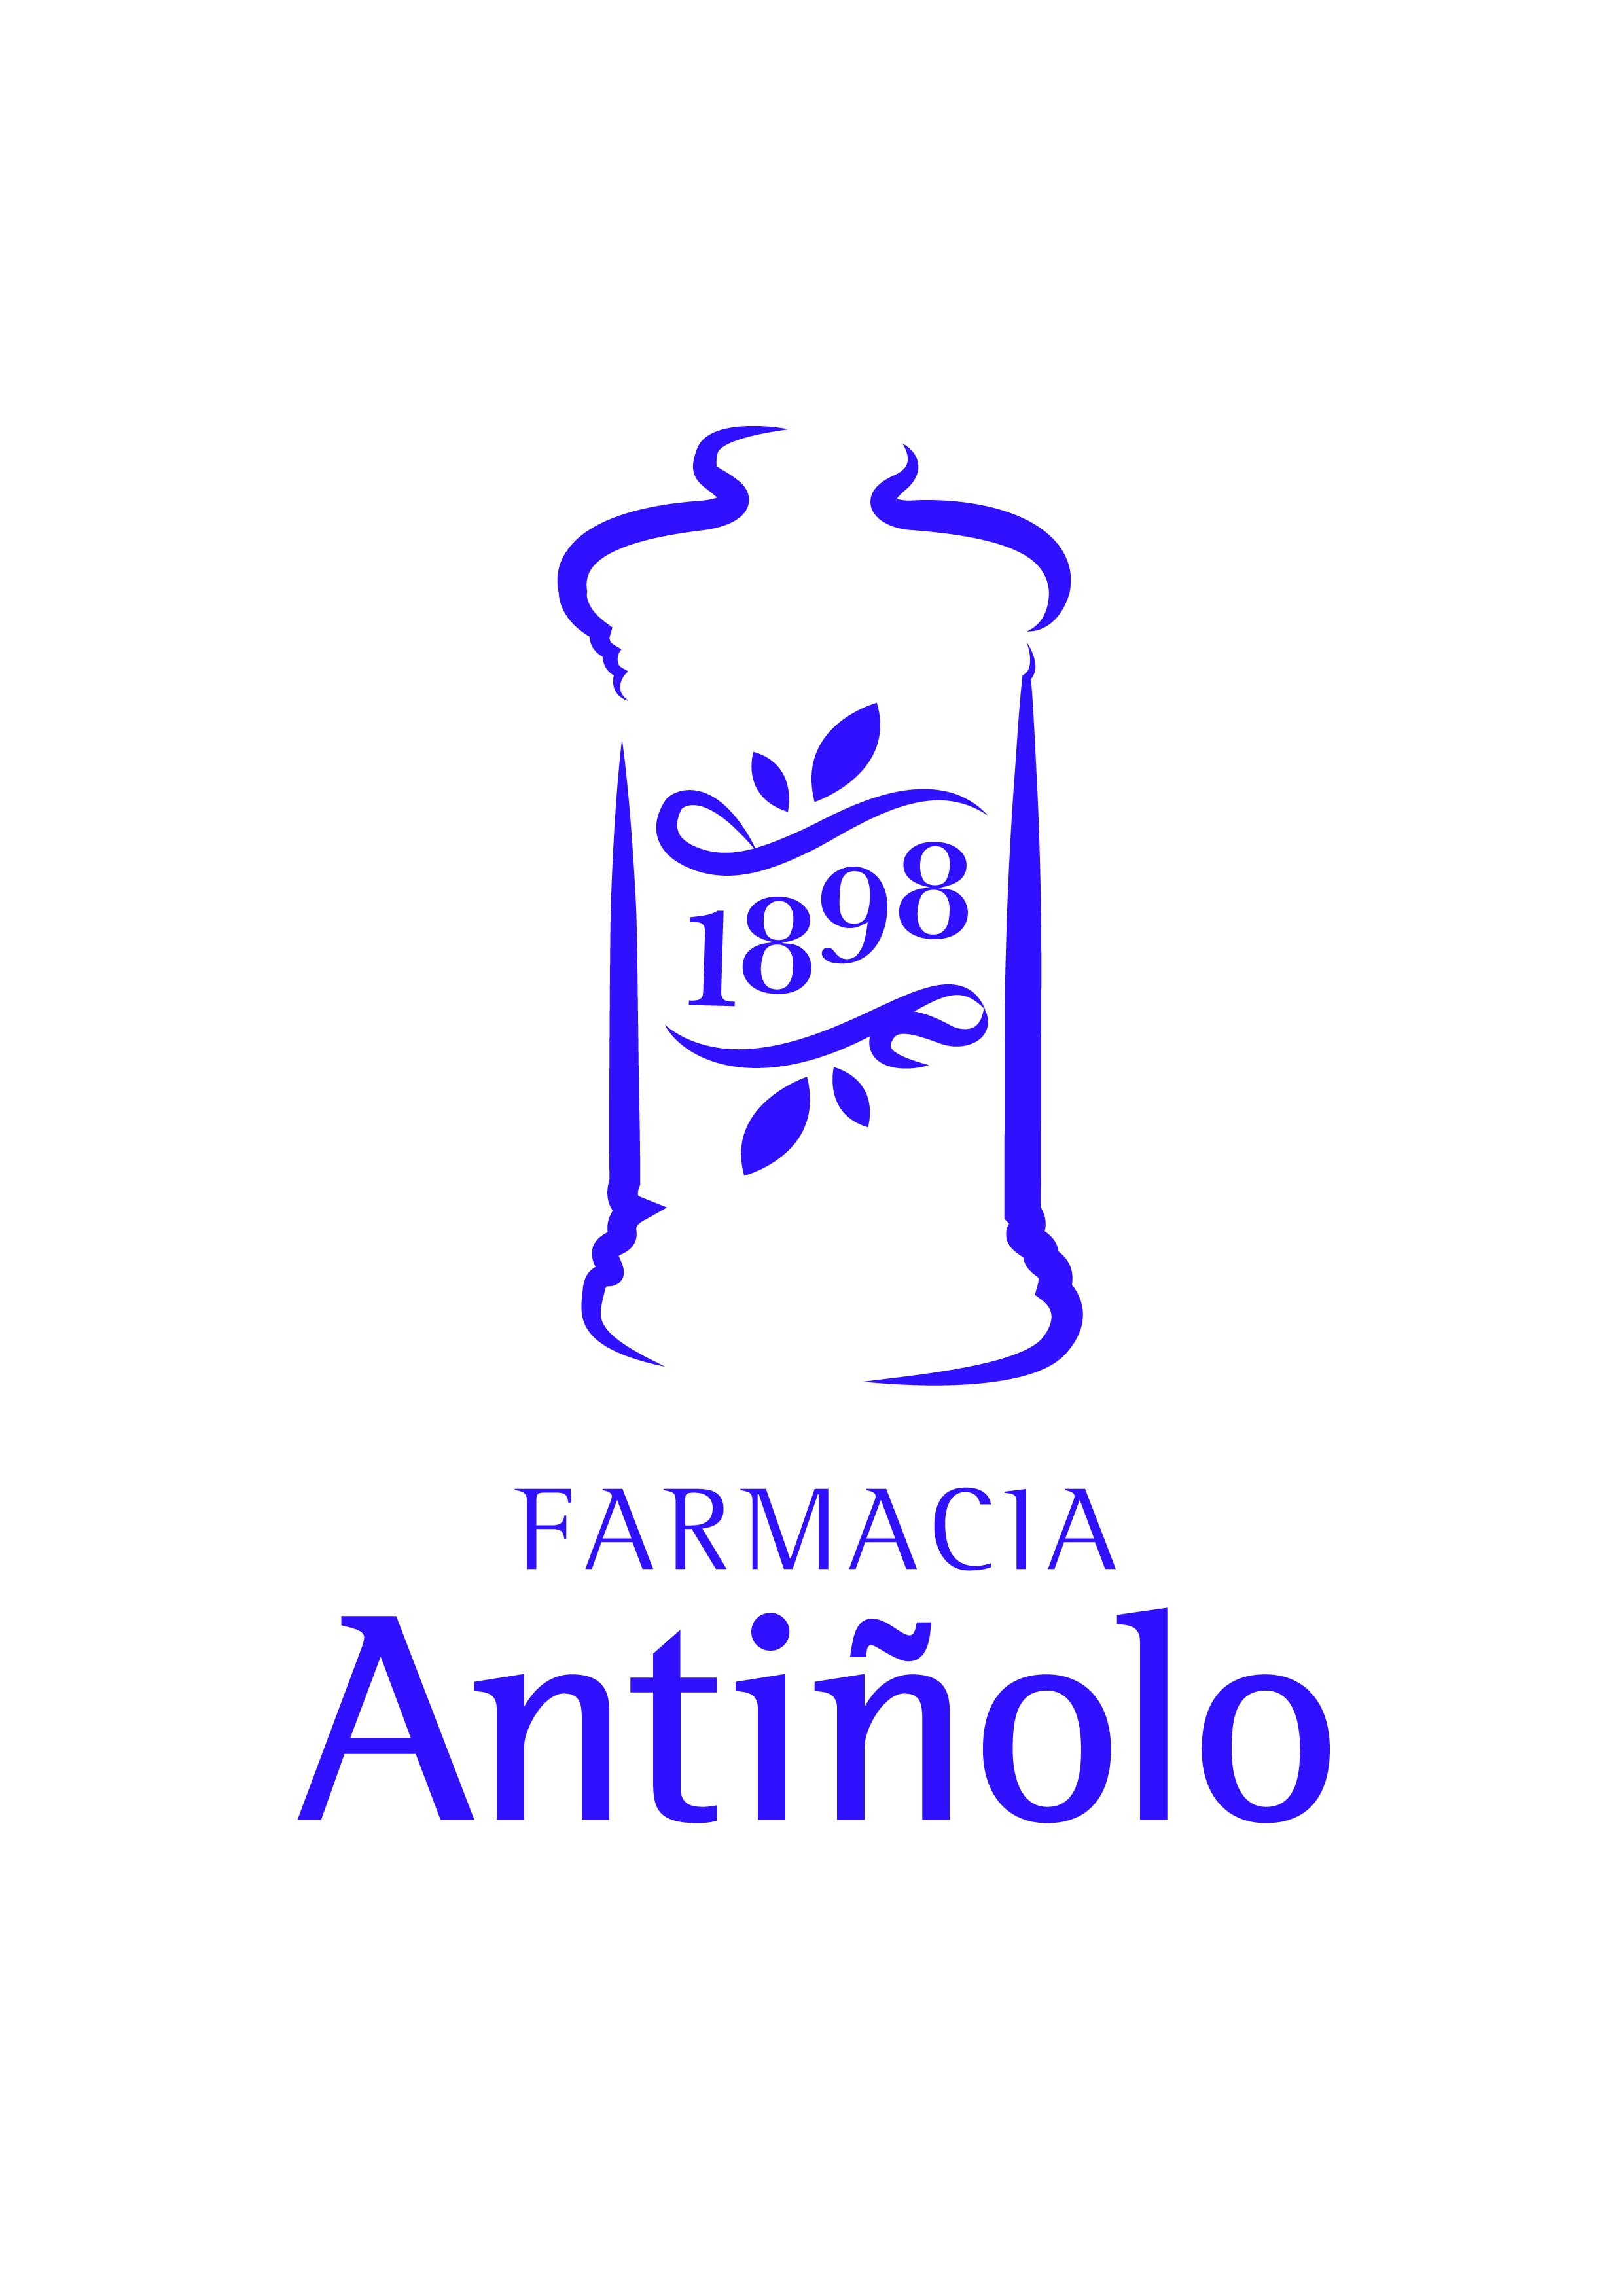 FARMACIA ANTIÑOLO